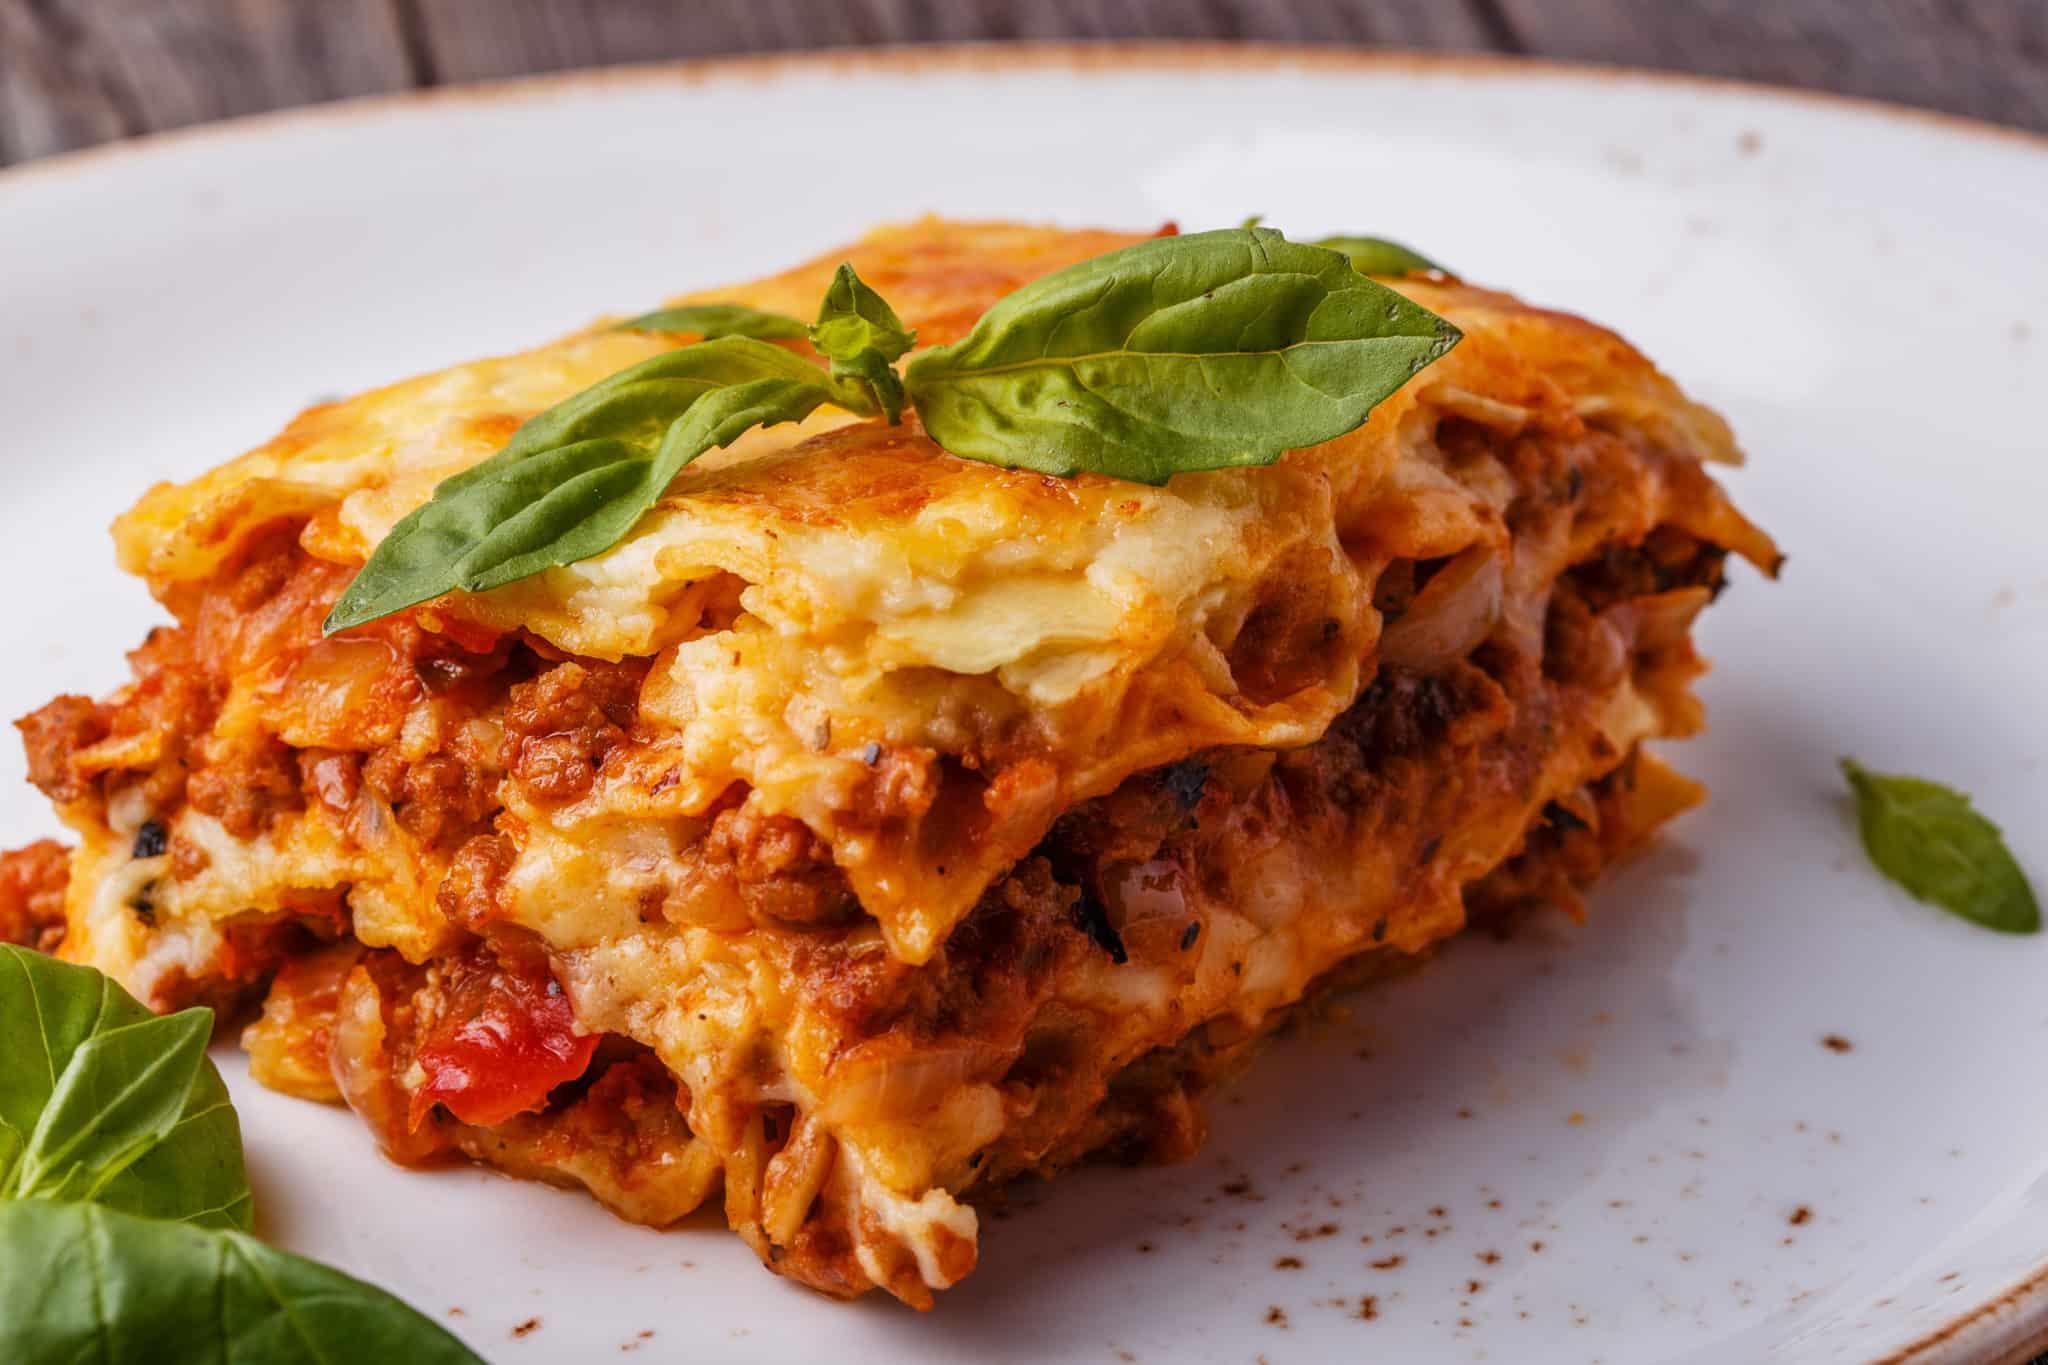 Marisol's vegetarian lasagna